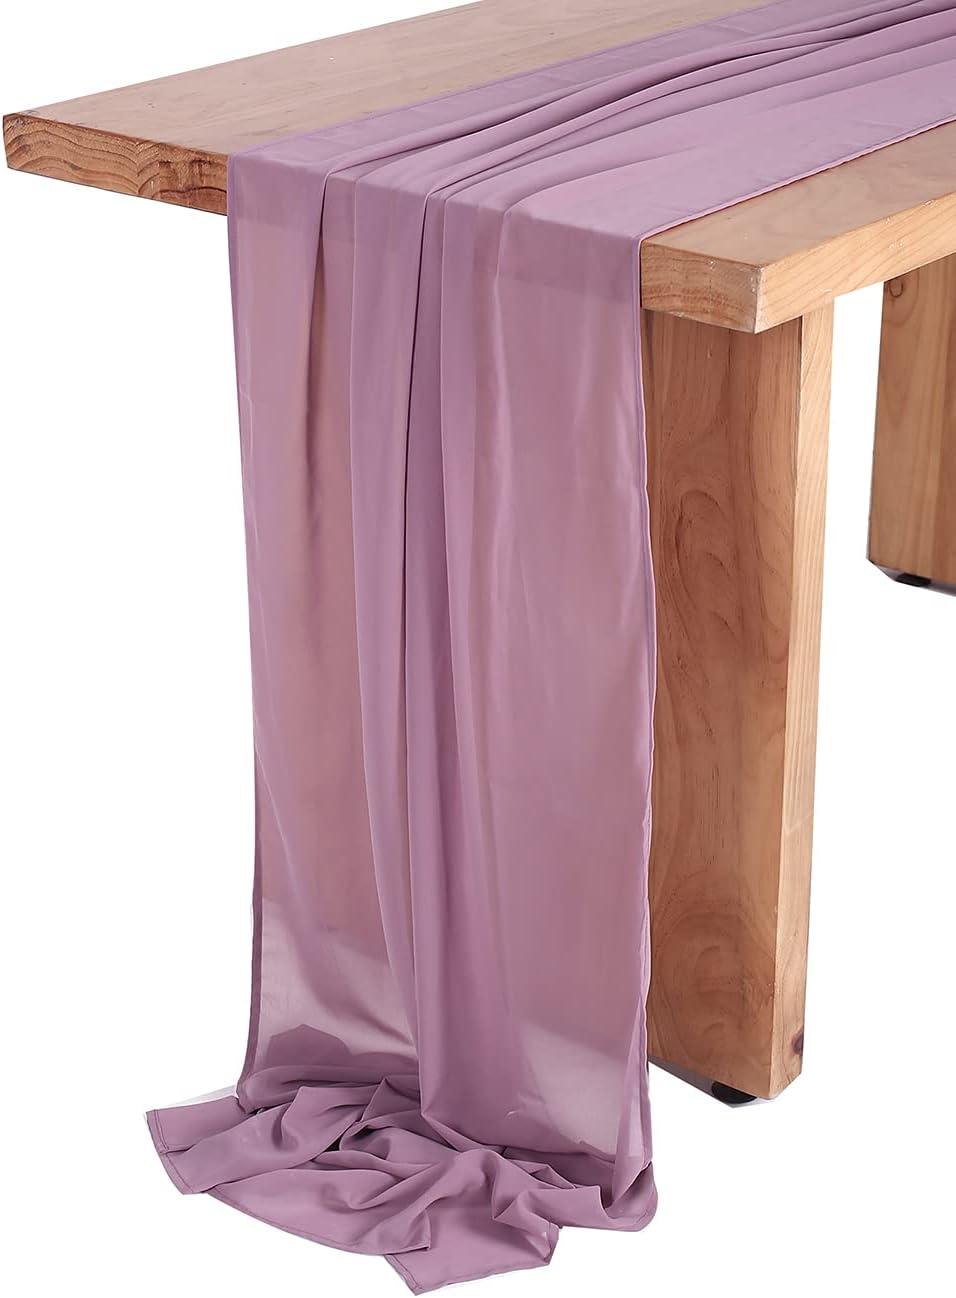 SHERWAY 27 x 168 Inch Deep Austin Mall E Mauve Wedding Table Chiffon Mail order Runner